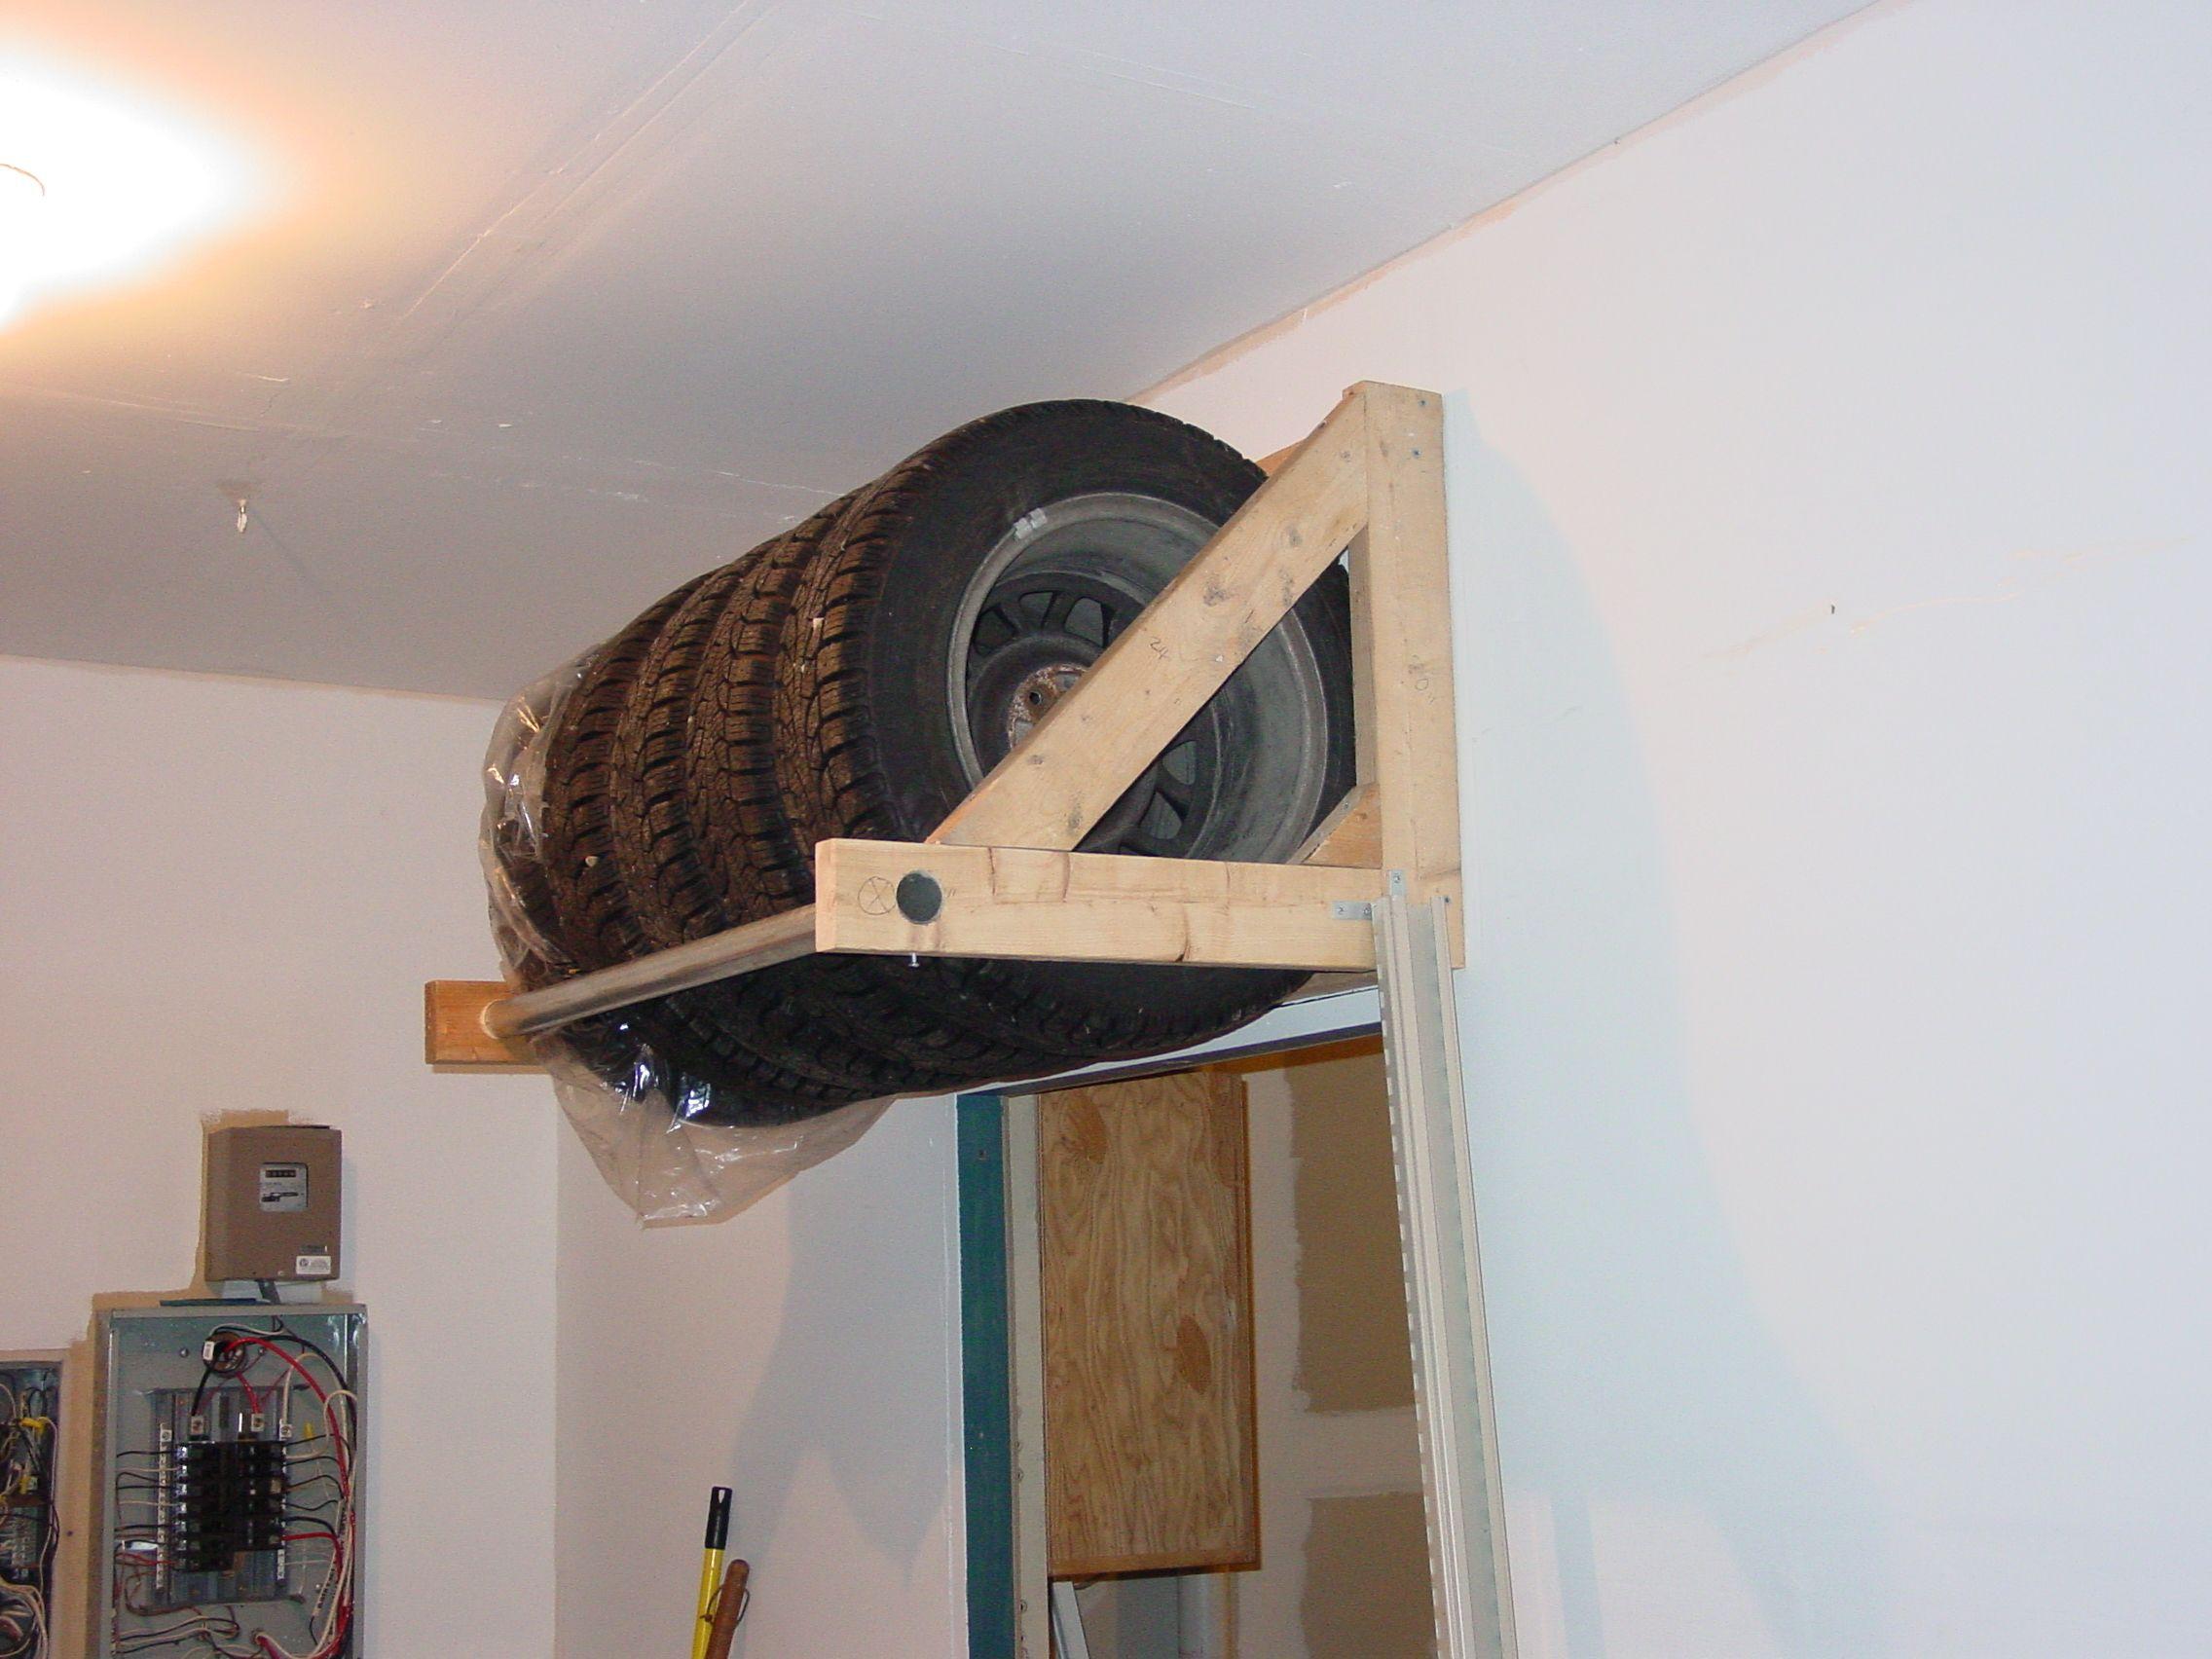 Tire Storage Or Rack The Garage Journal Board Tire Storage Garage Organization Garage Organization Diy